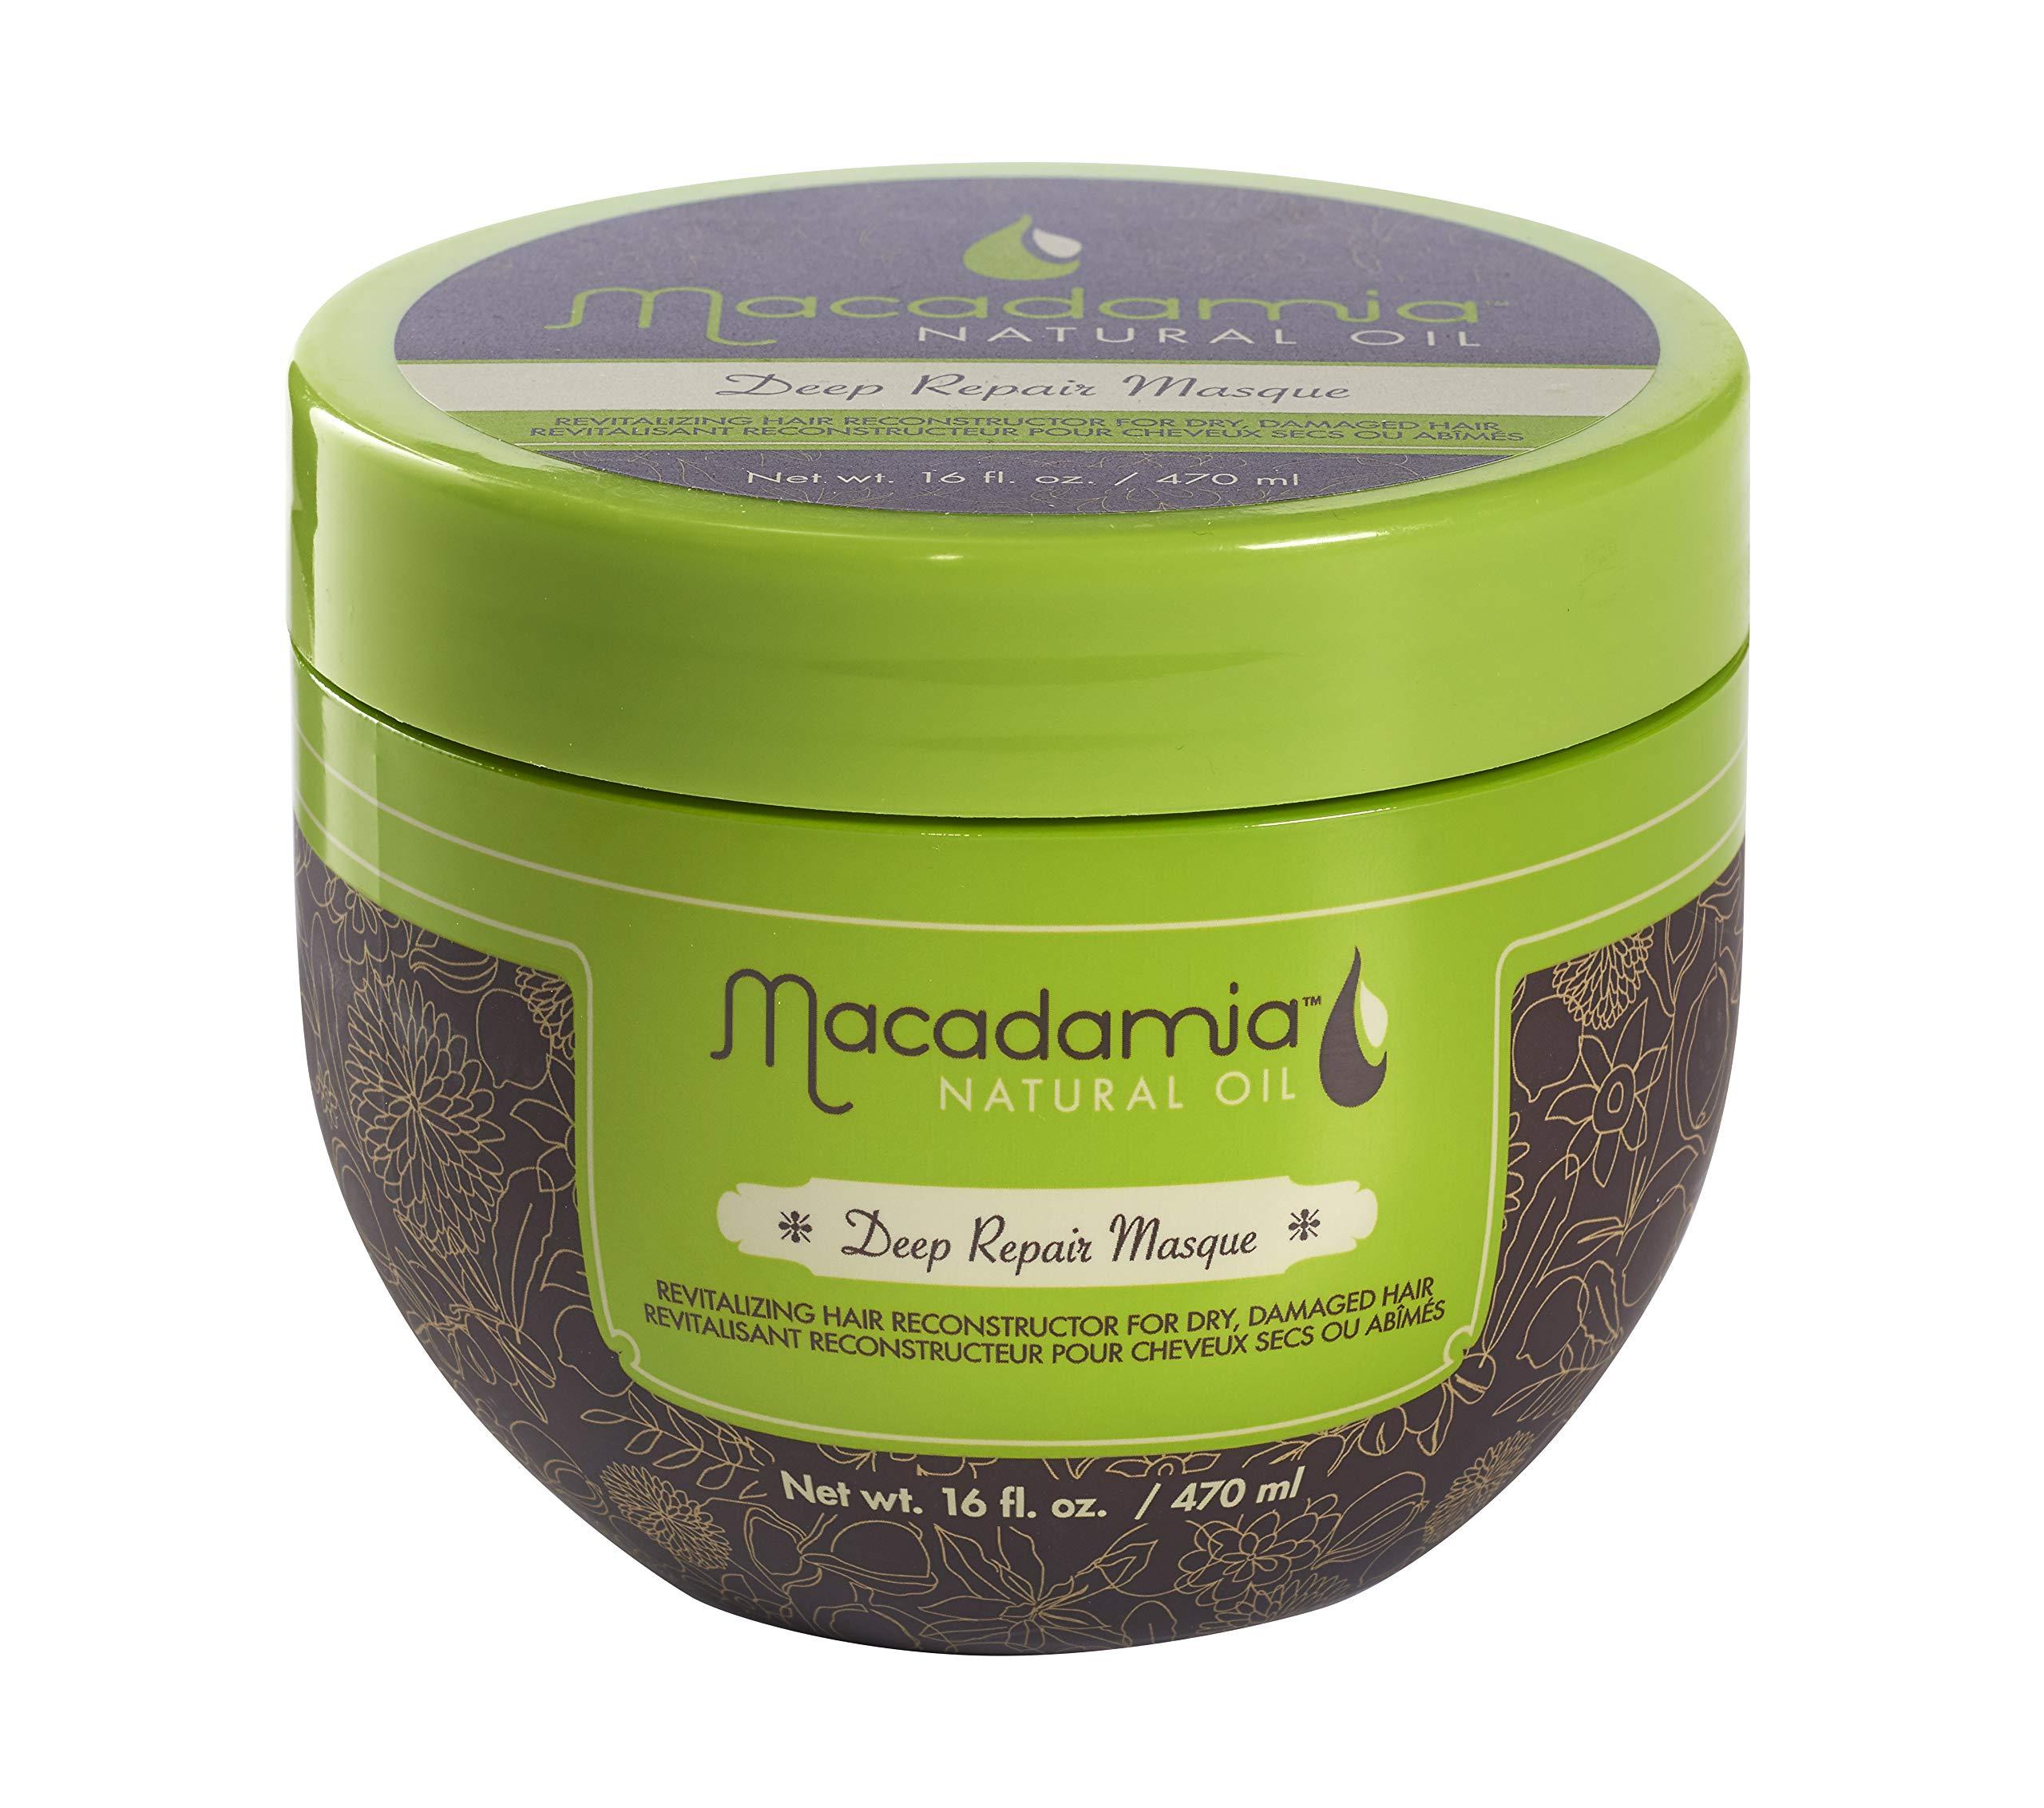 Macadamia Natural Oil Deep Repair Masque, 16 FL OZ by Macadamia Natural Oil